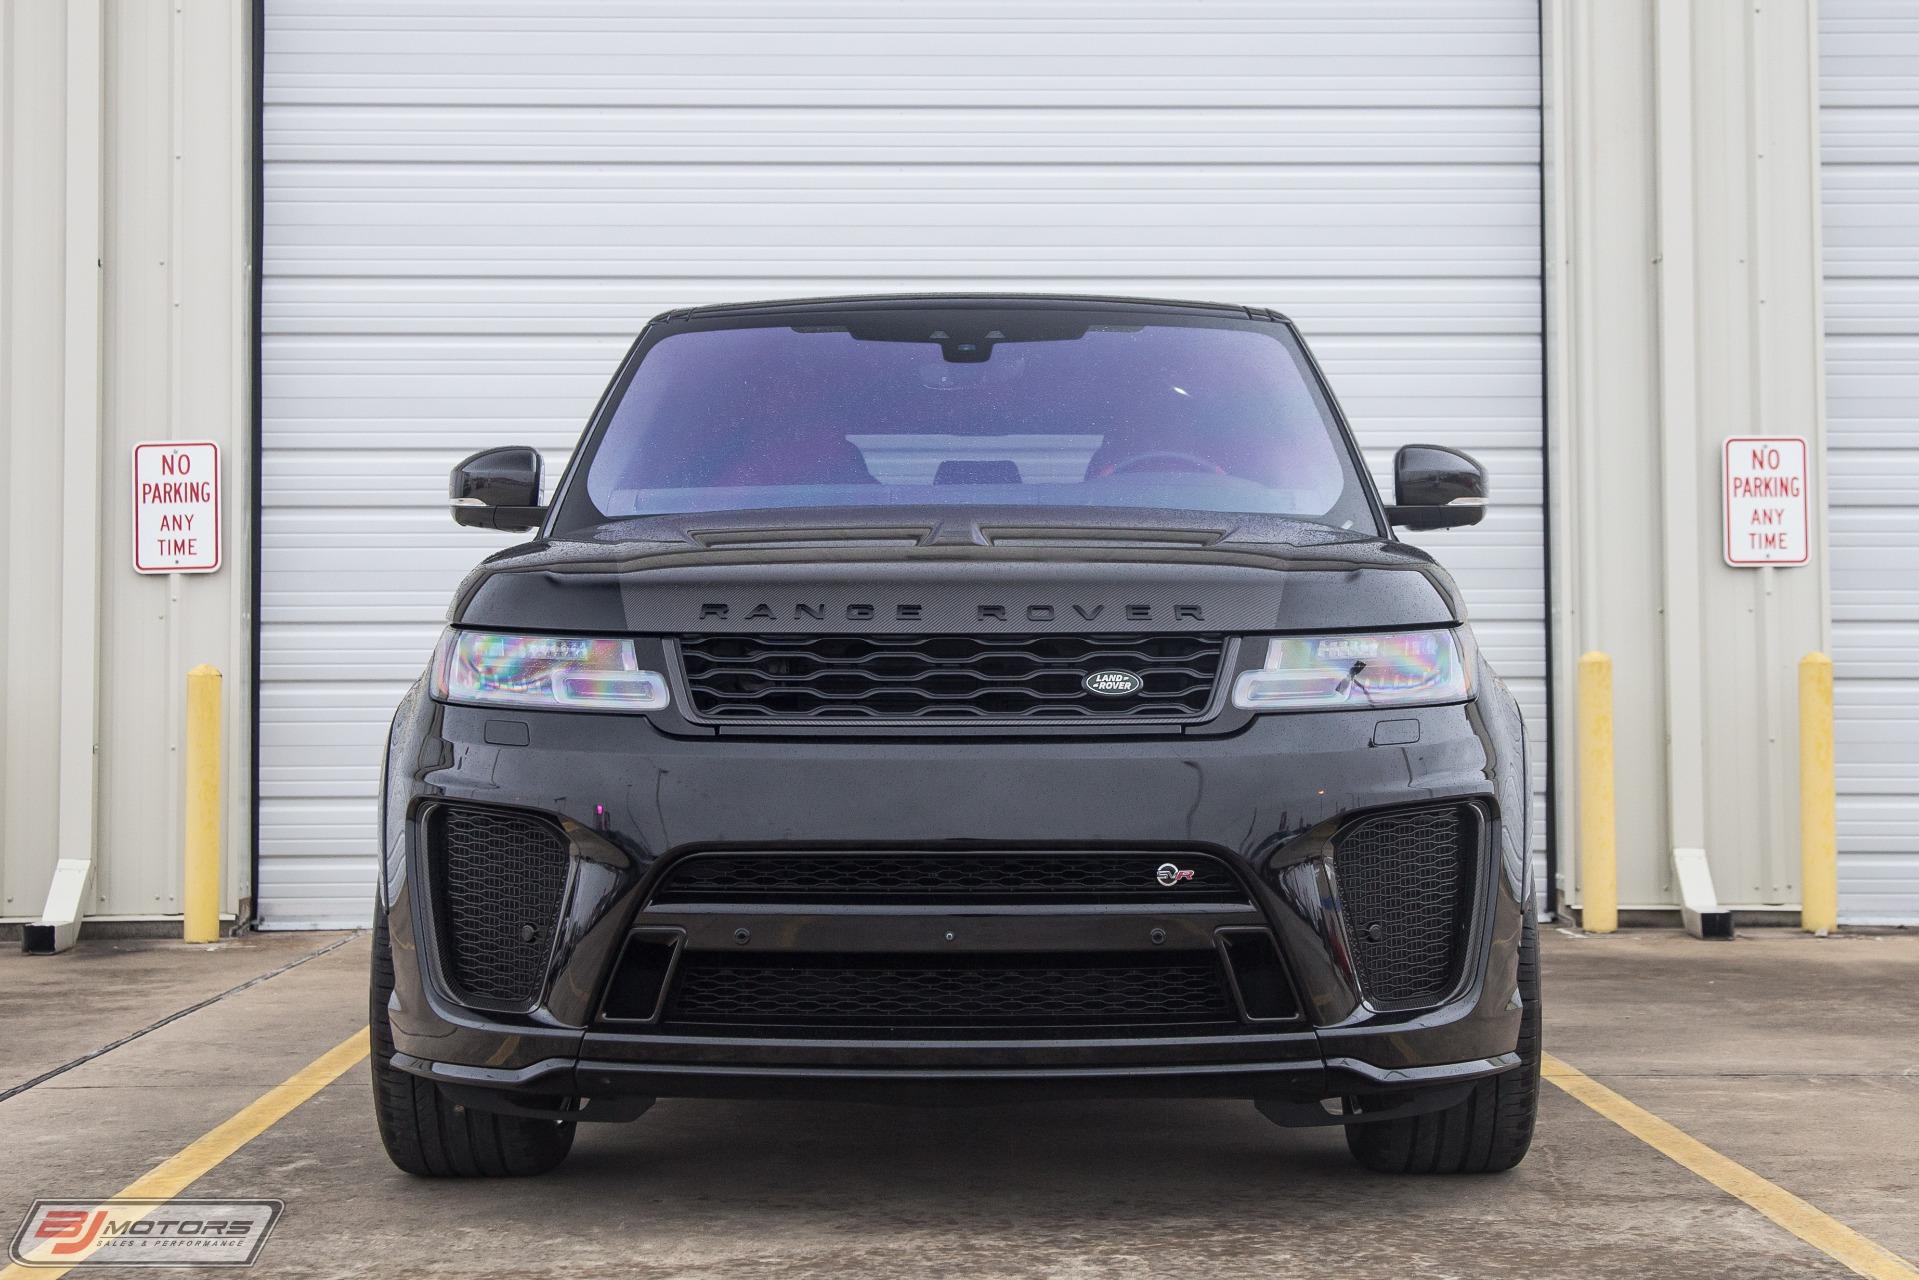 Used-2018-Land-Rover-Range-Rover-Sport-SVR